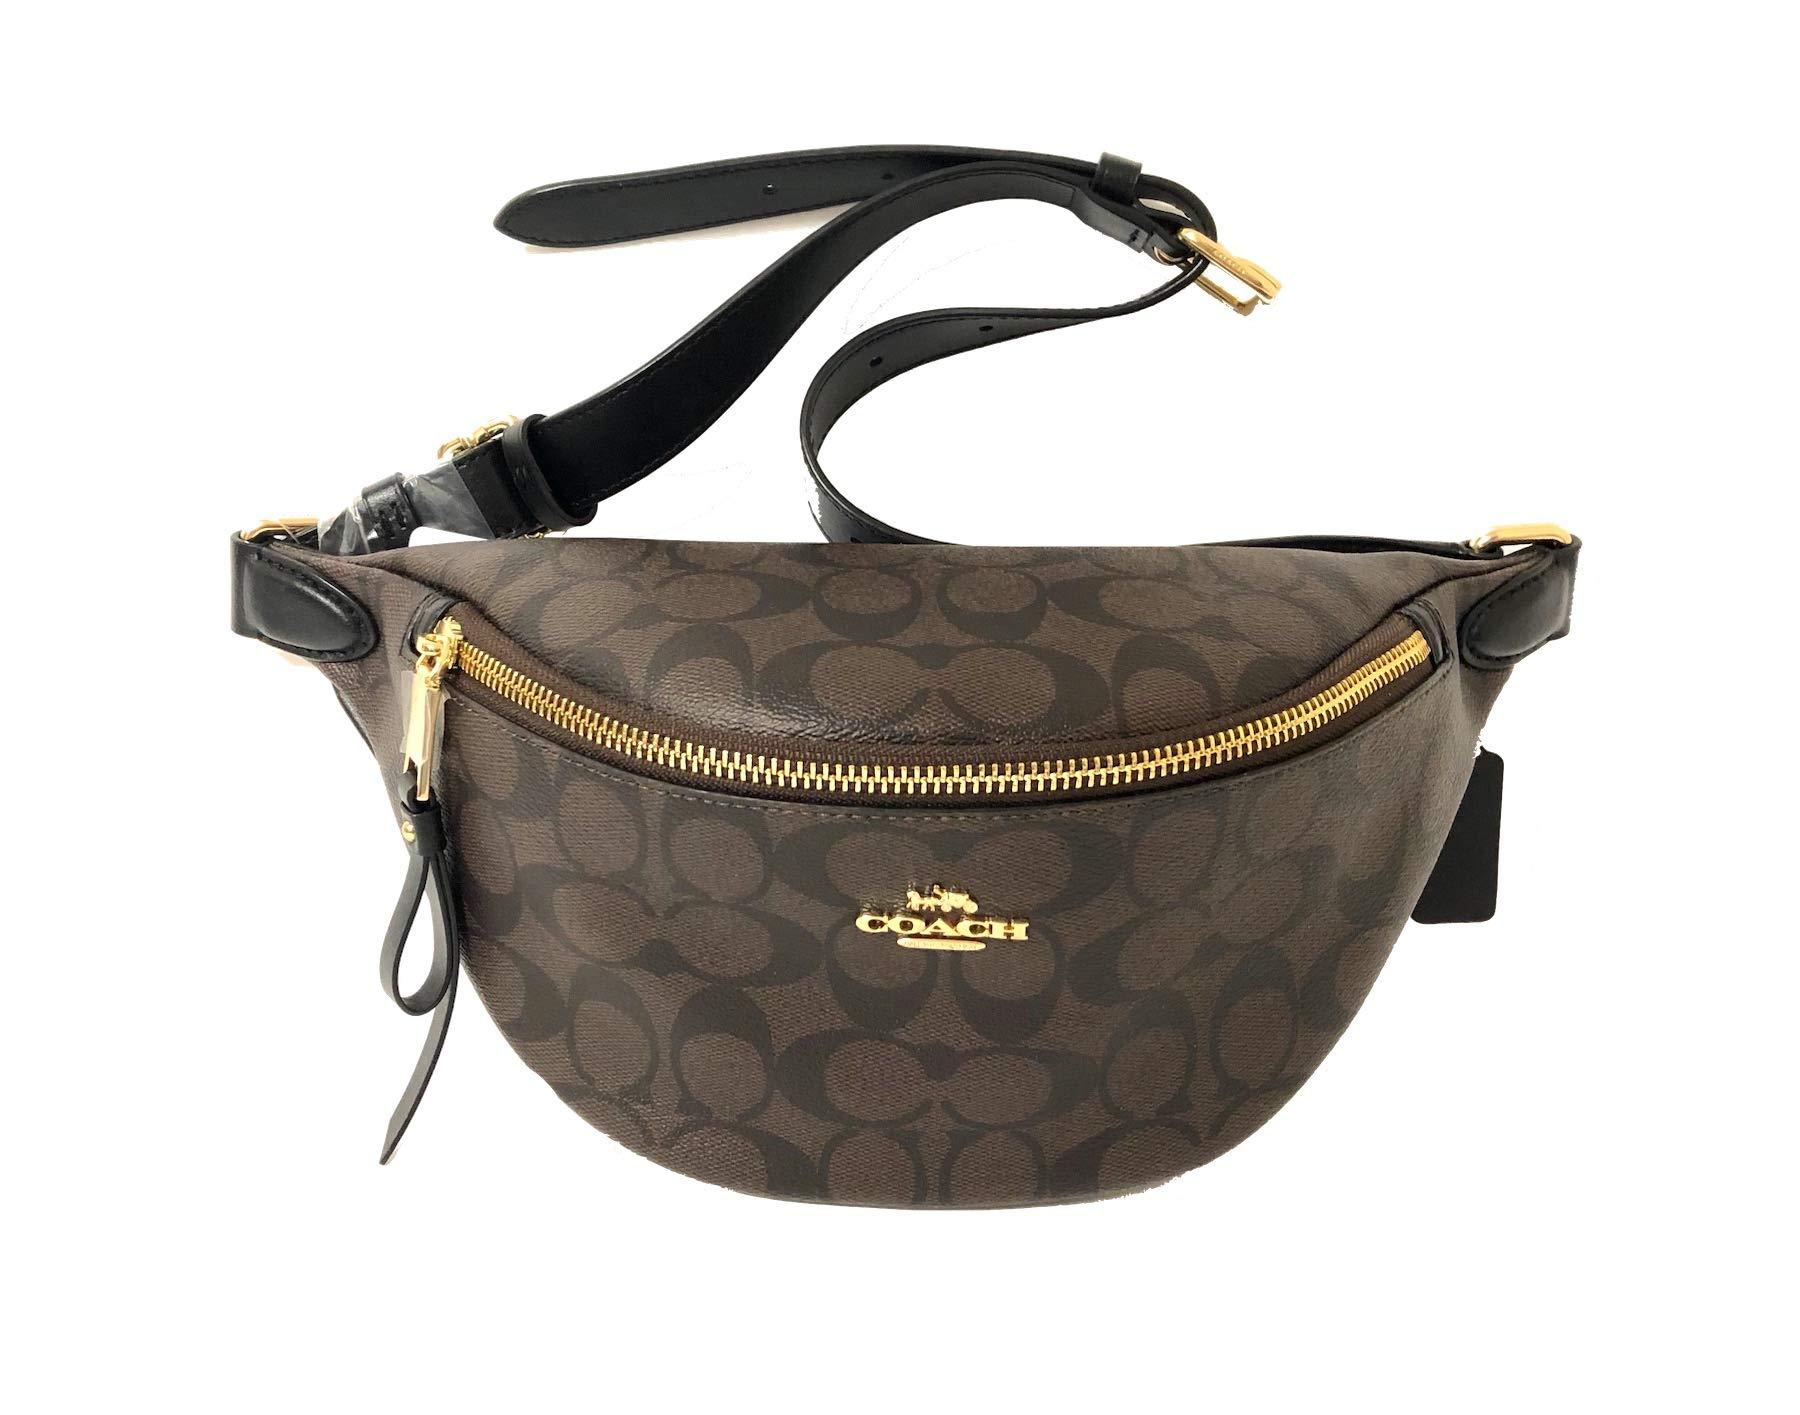 Coach Signature Belt Bag F48740 IMAA8 Brown/Black